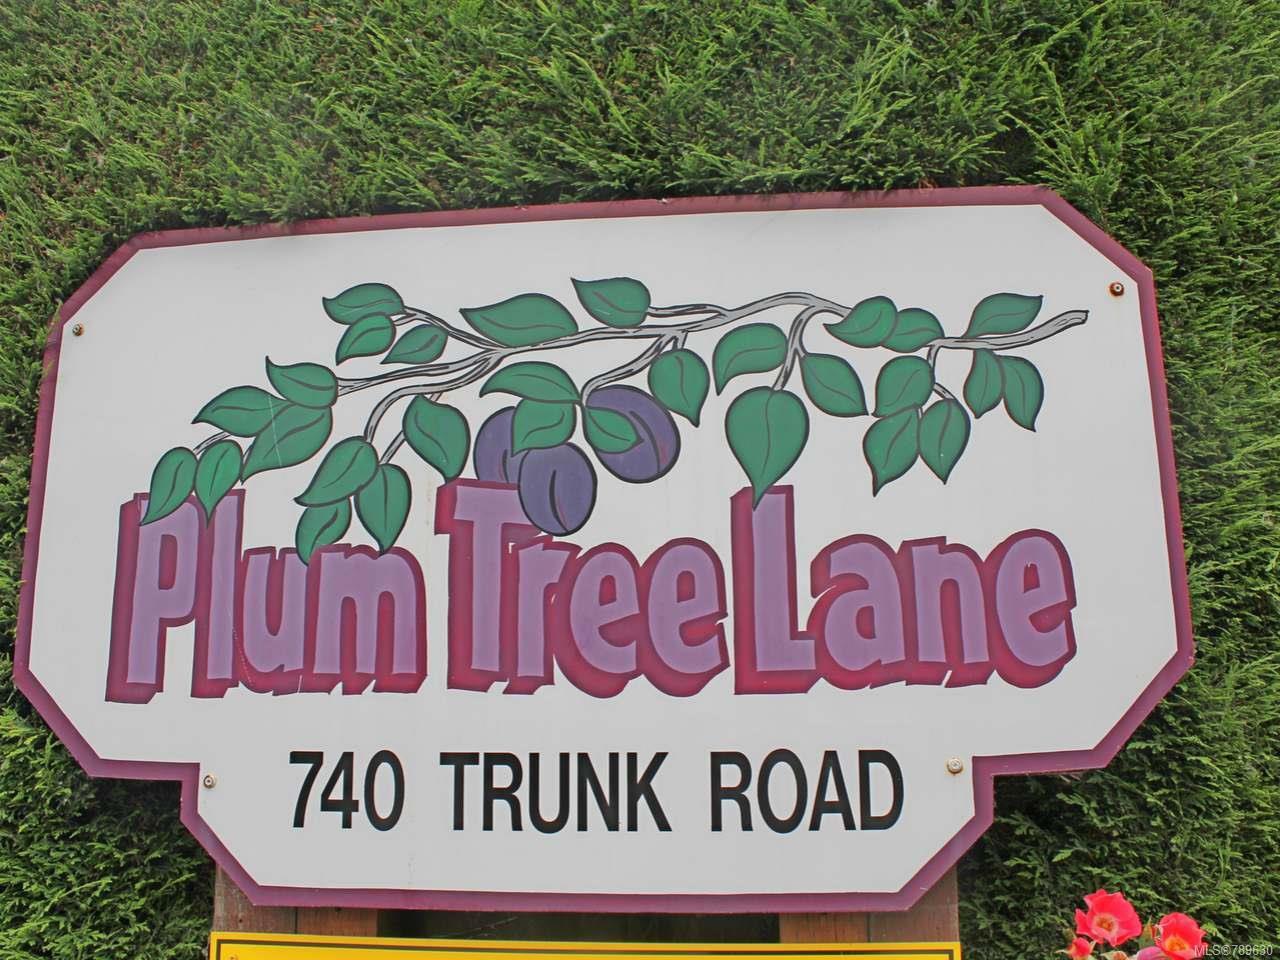 Main Photo: 305 740 TRUNK ROAD in DUNCAN: Du East Duncan Condo for sale (Duncan)  : MLS®# 789630